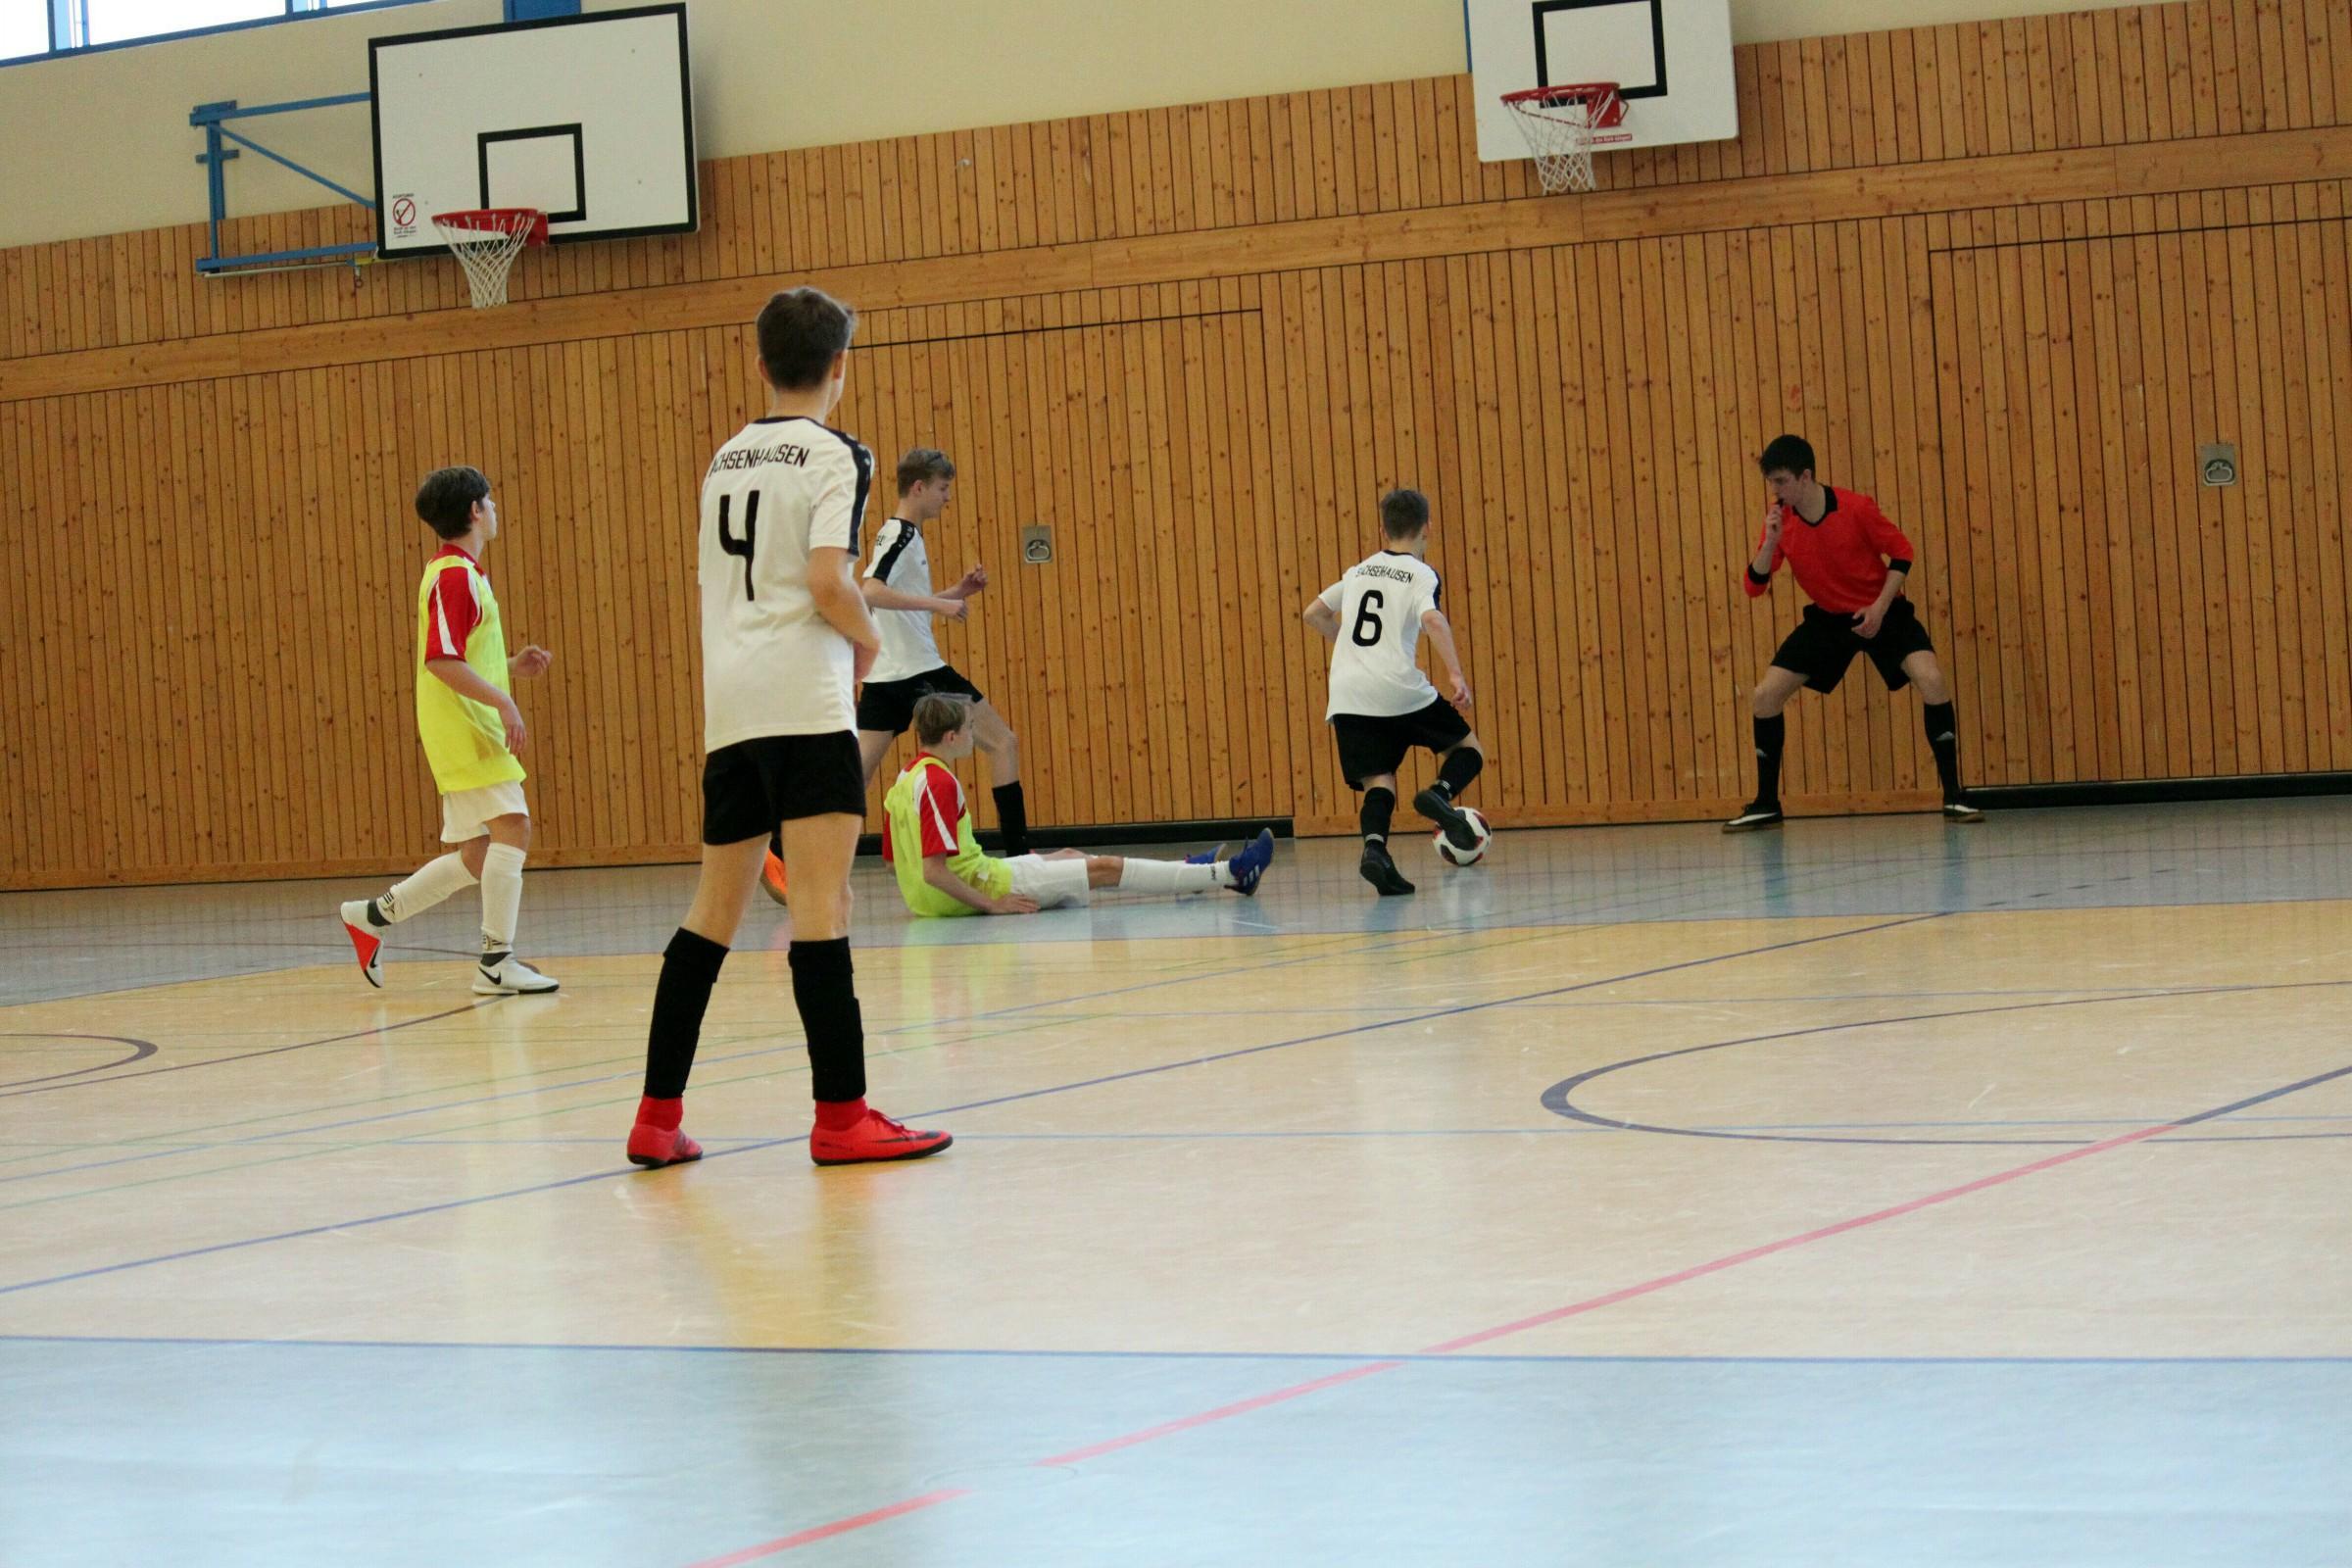 20190217 3. Wandlitzer Hallen-Cup der C-Junioren  (3)